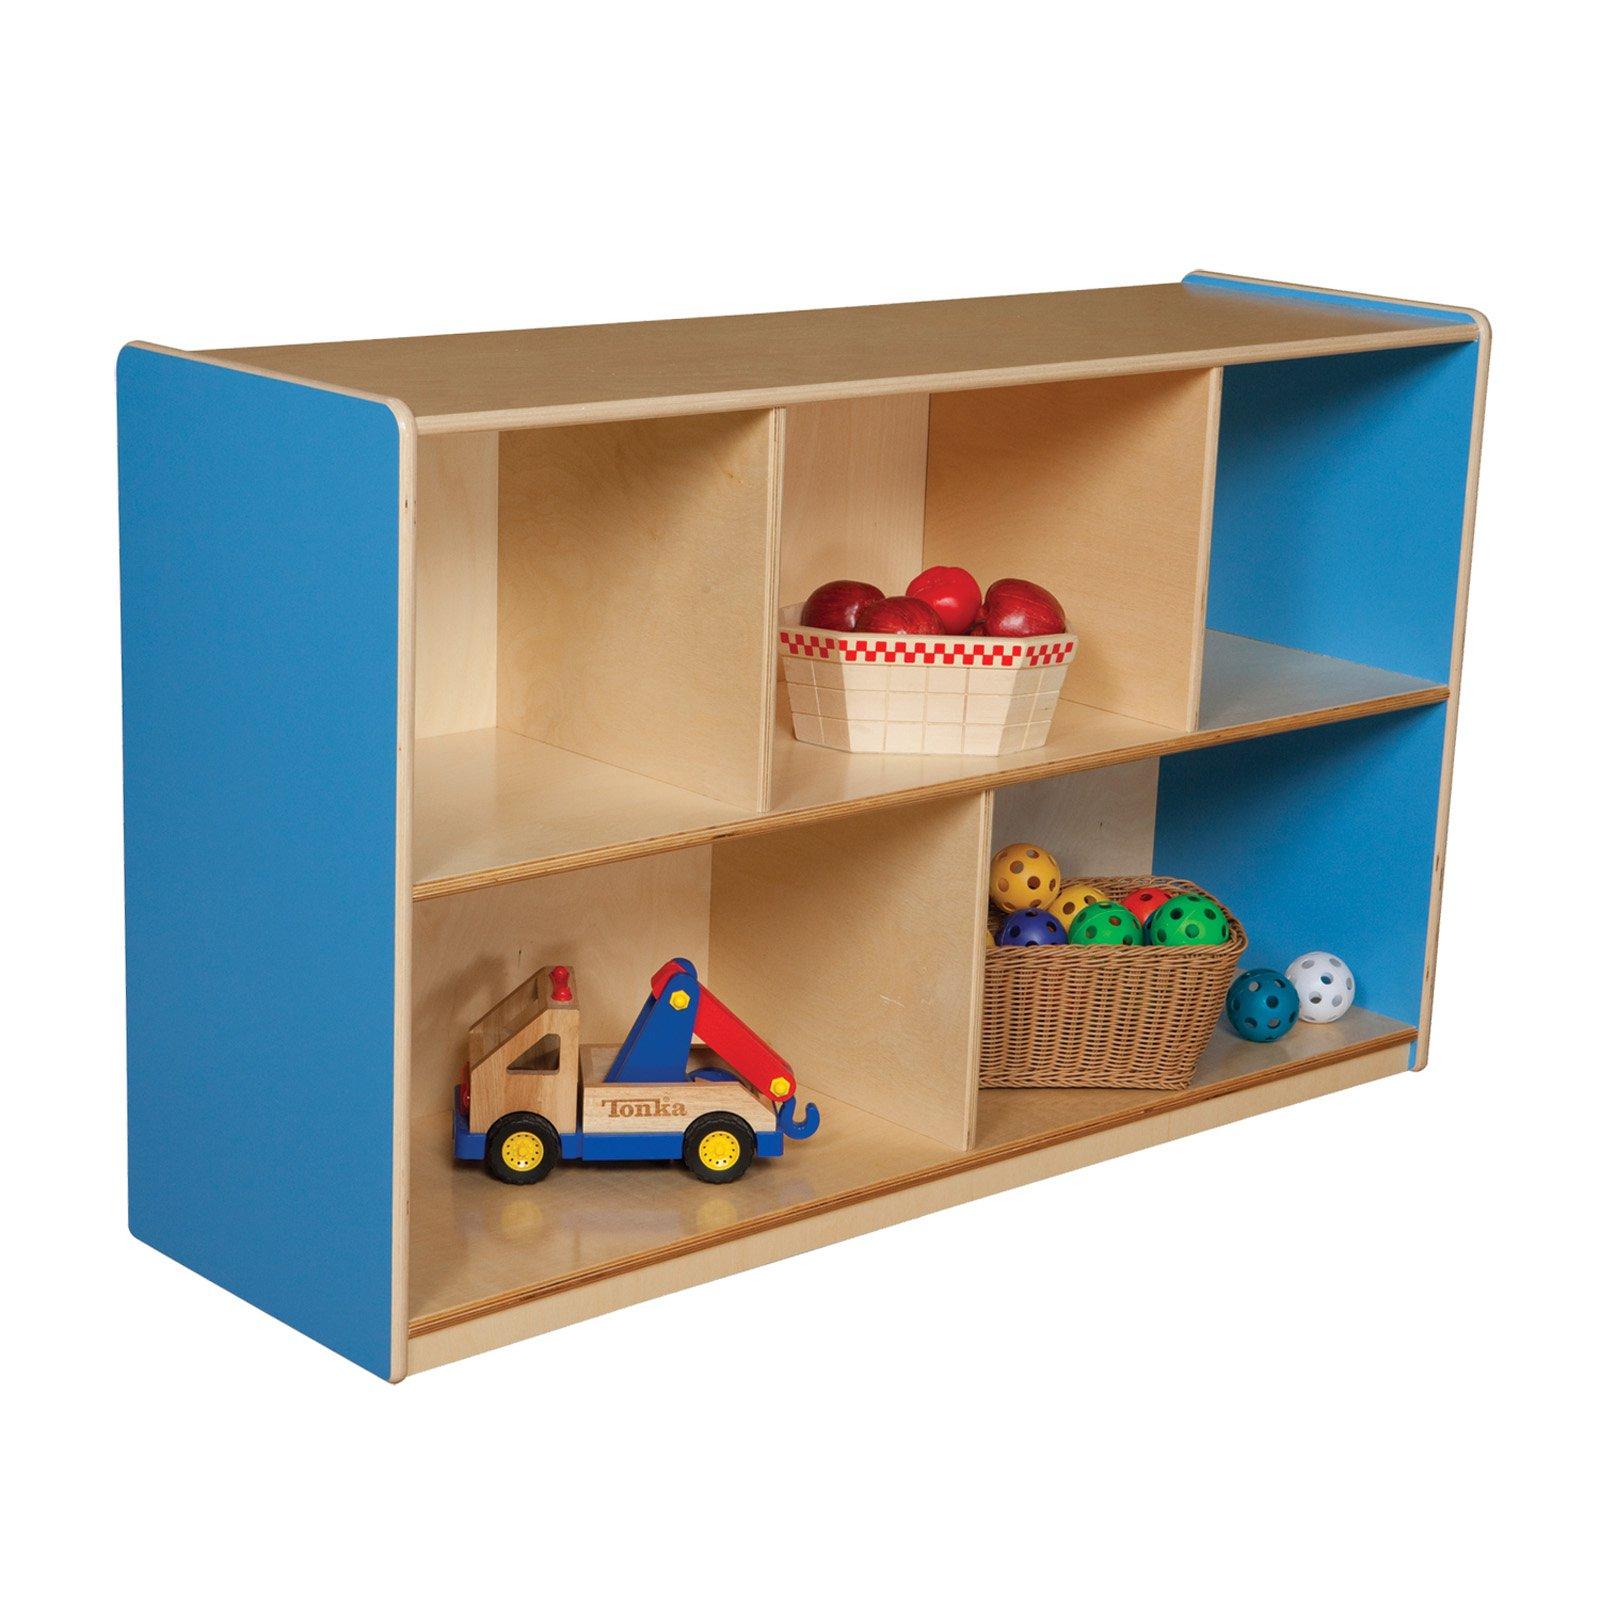 Wood Designs 30H in. Single Storage